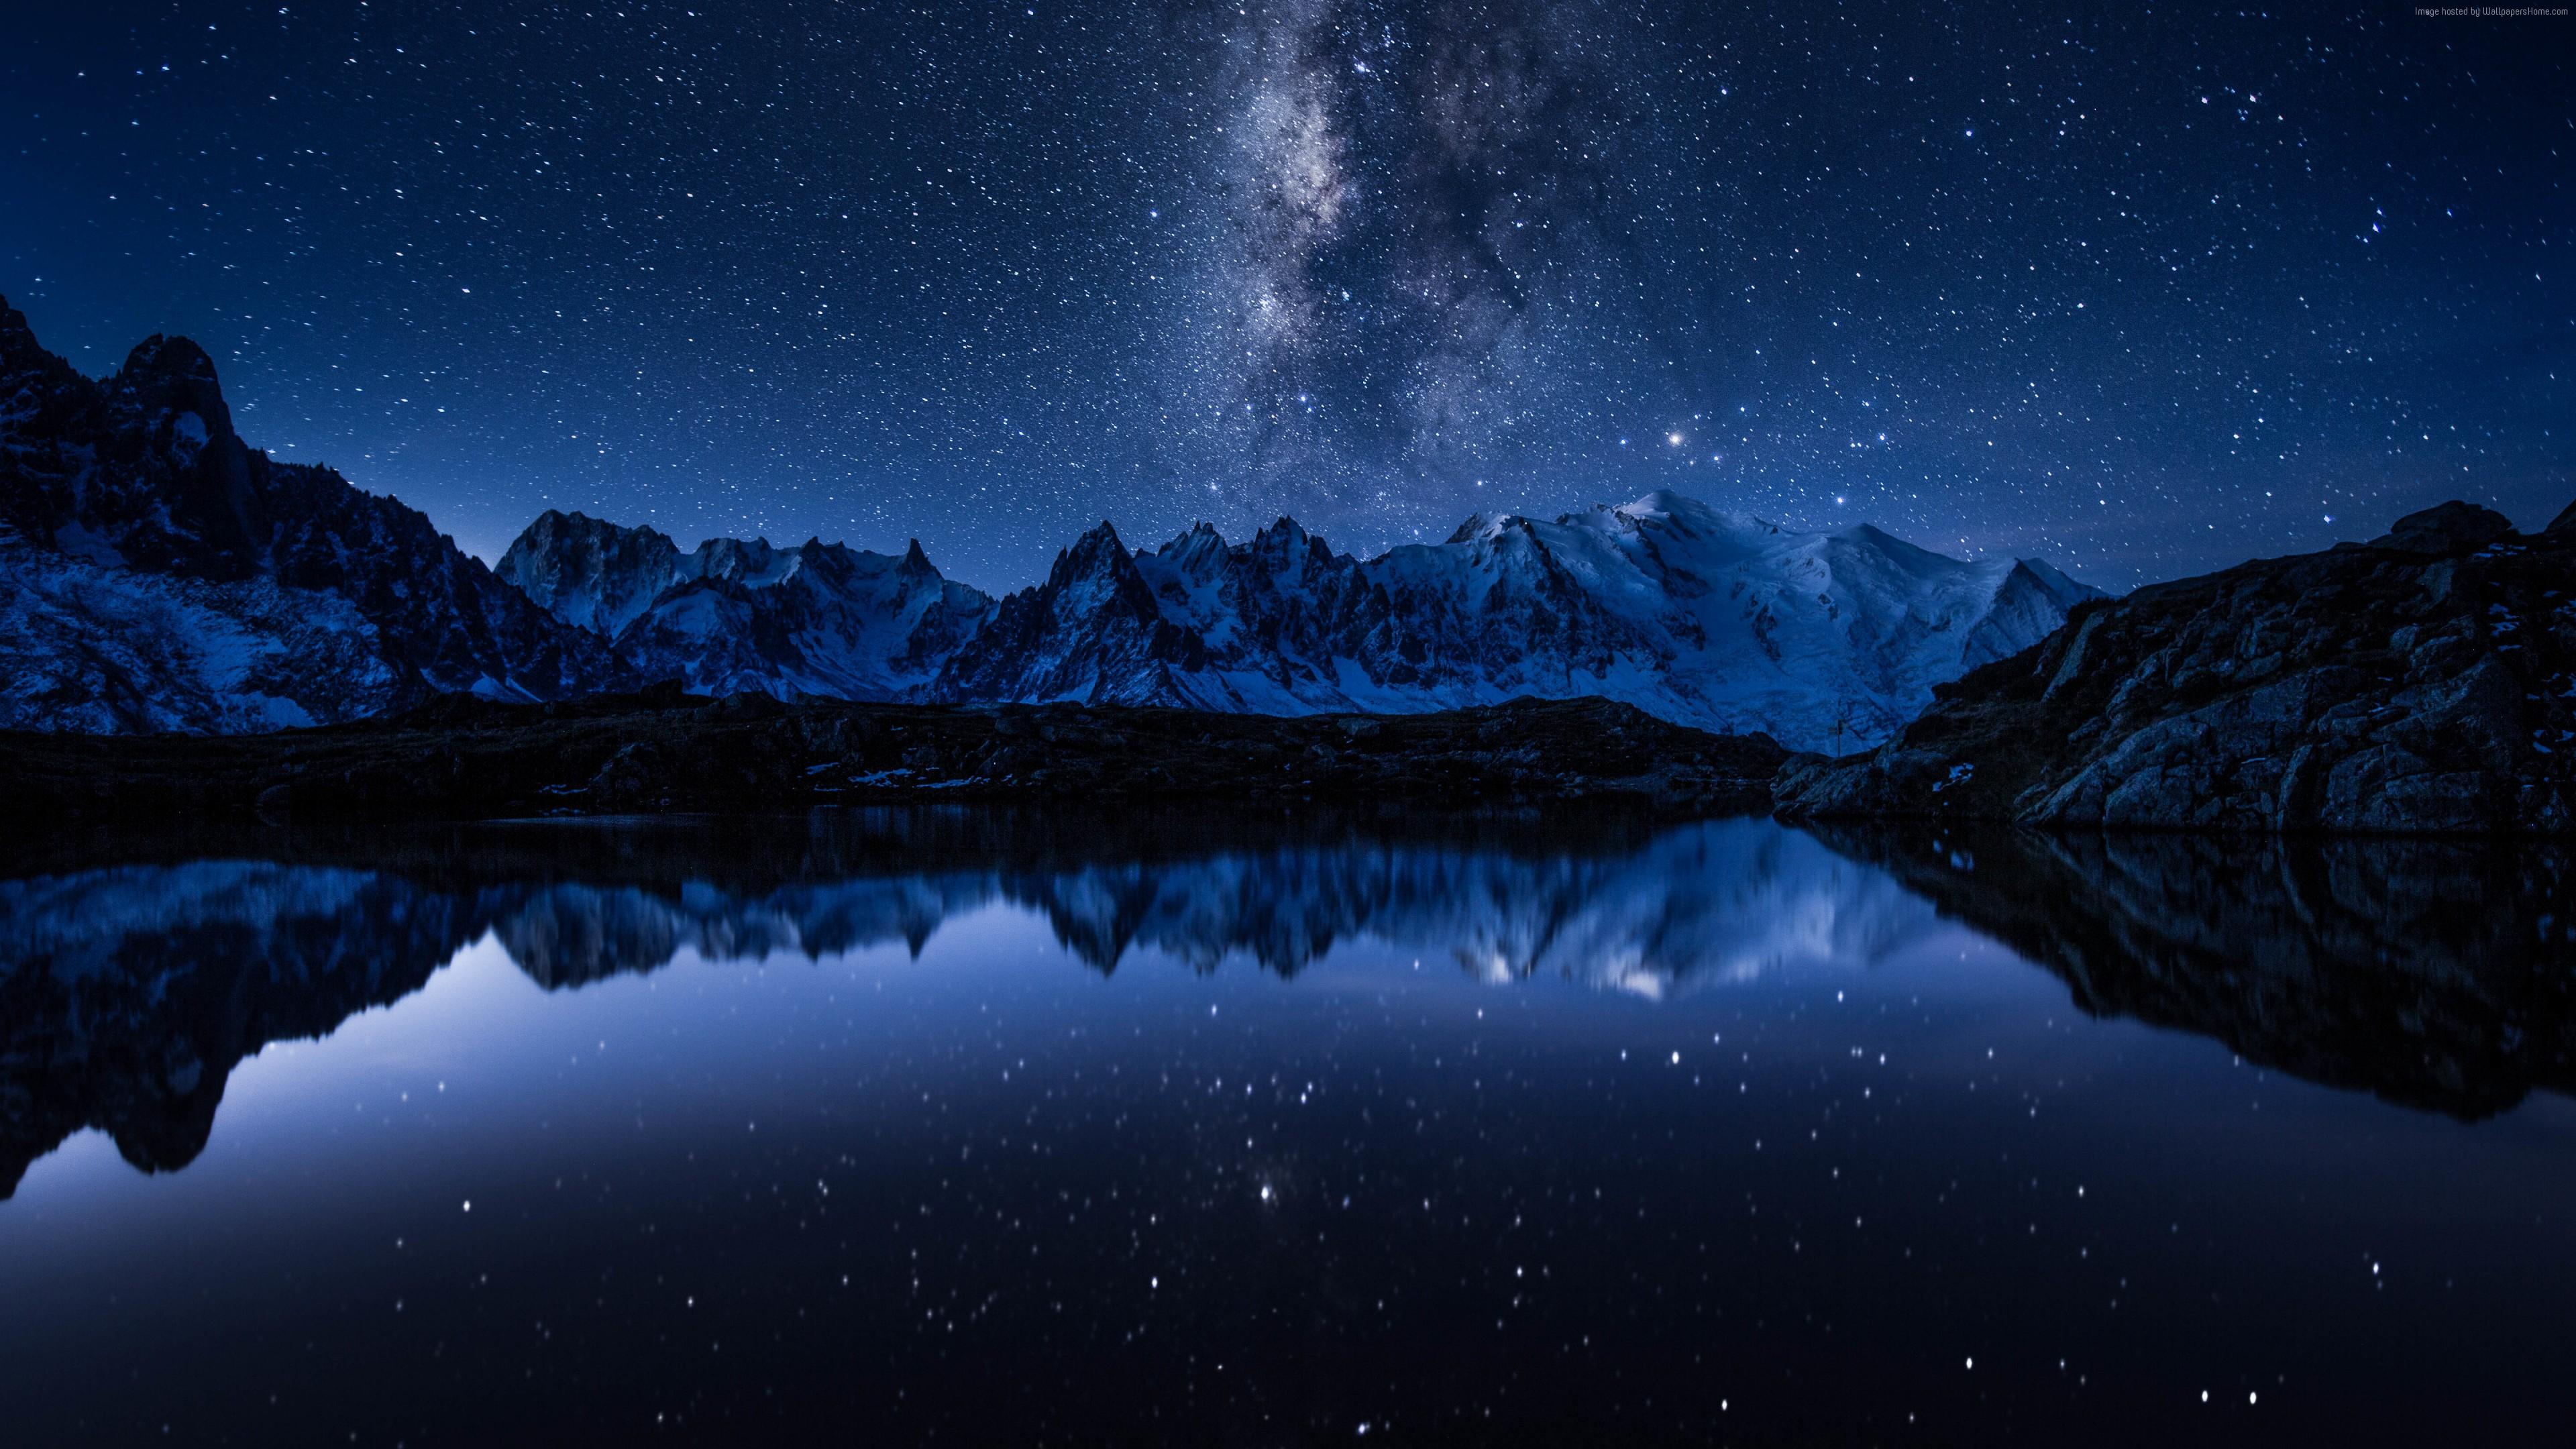 Previous Wallpaper Milky Way Wallpaper 5k 2191957 Hd Wallpaper Backgrounds Download